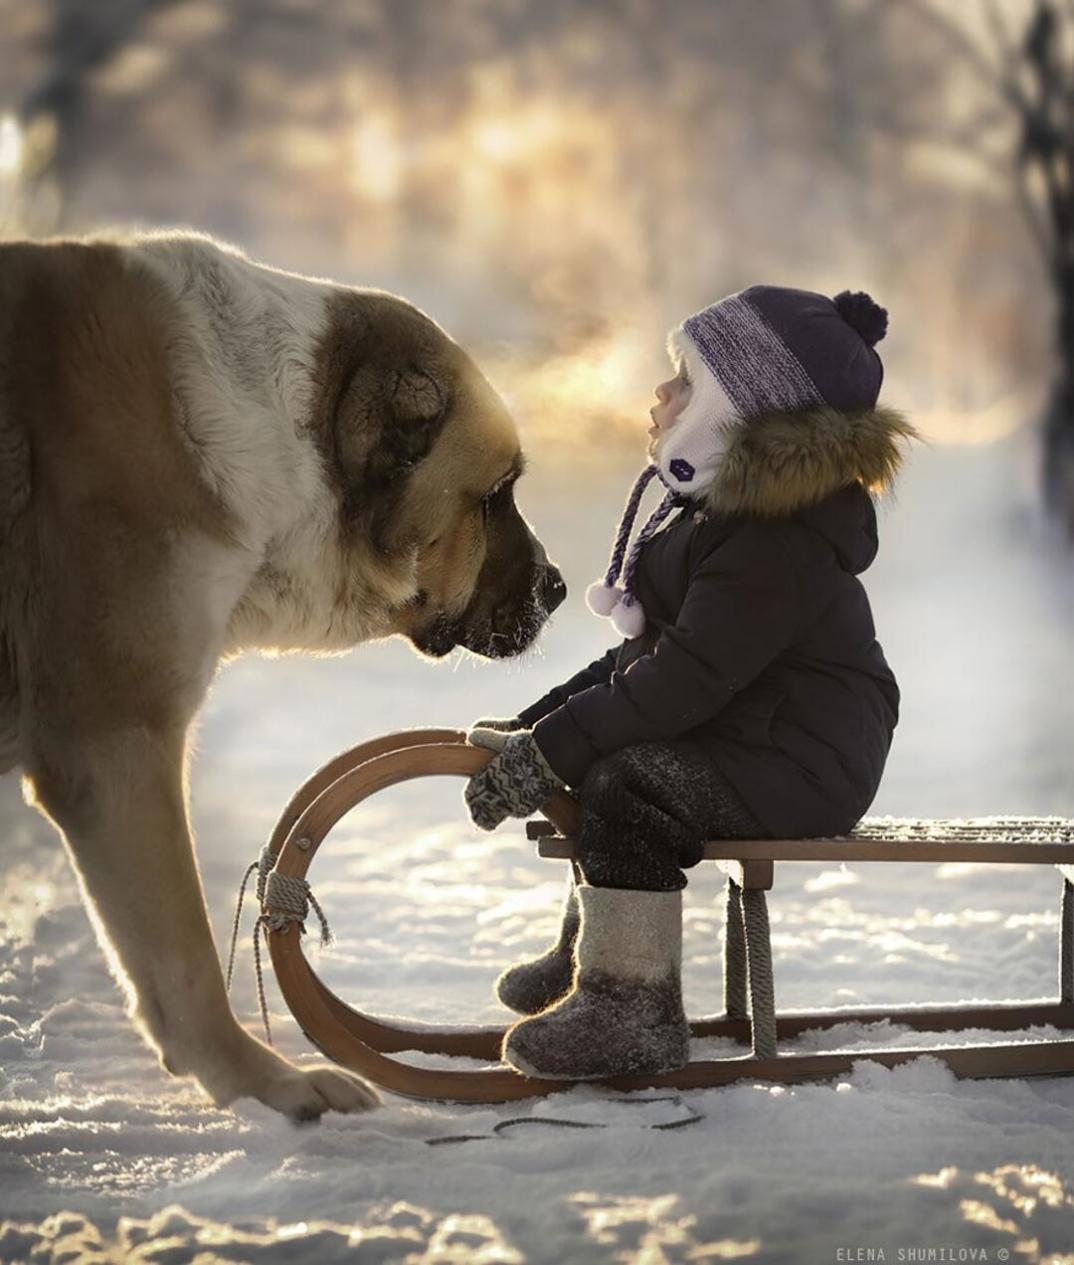 animali-bambini-fotografia-elena-shumilova-09